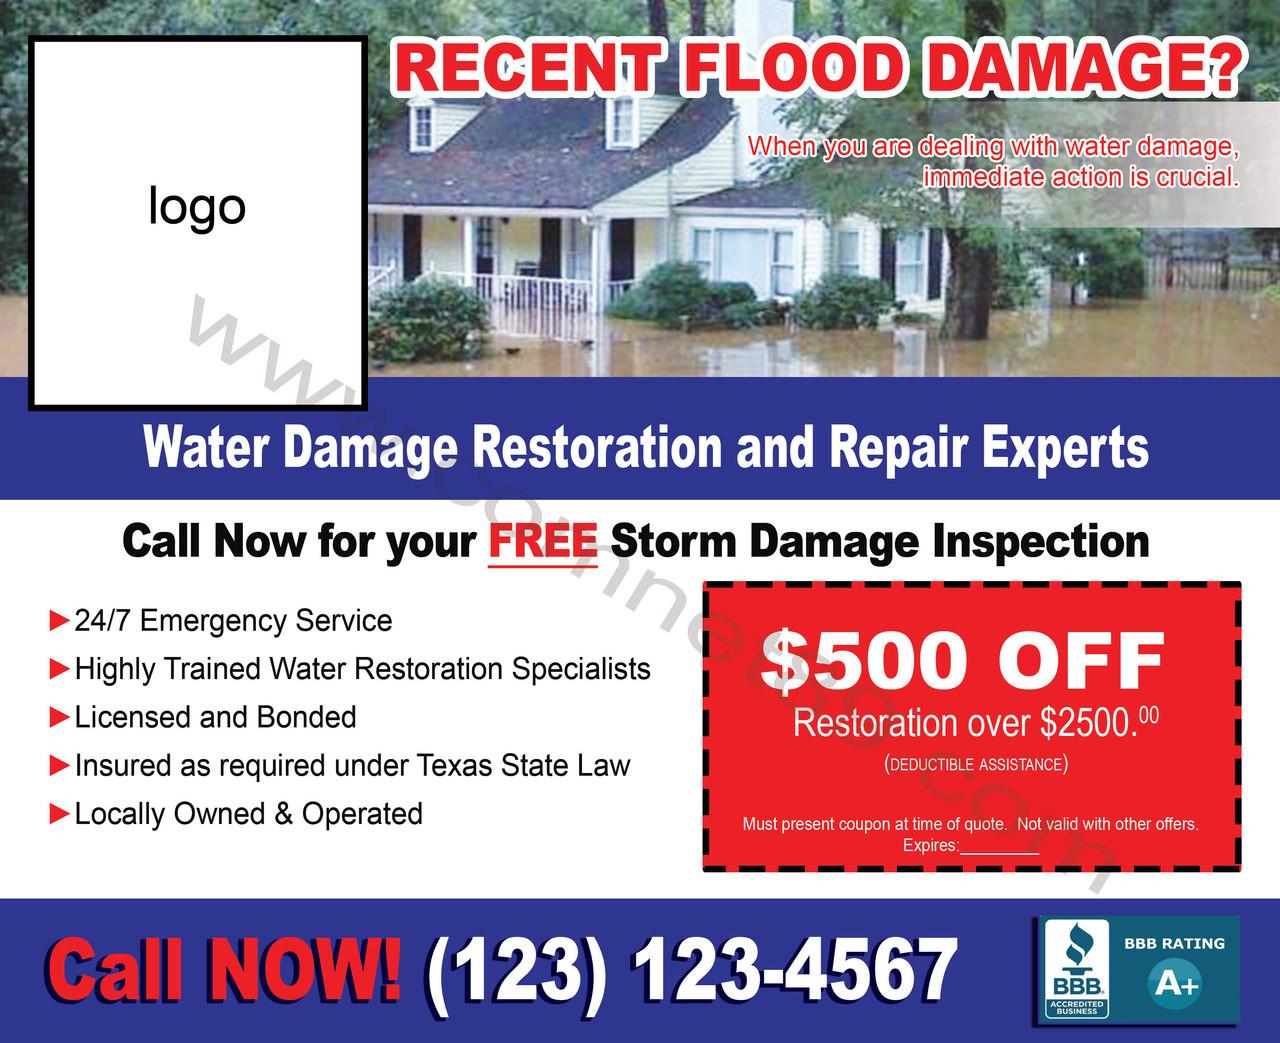 Flood Damage 04 EDDM Postcard